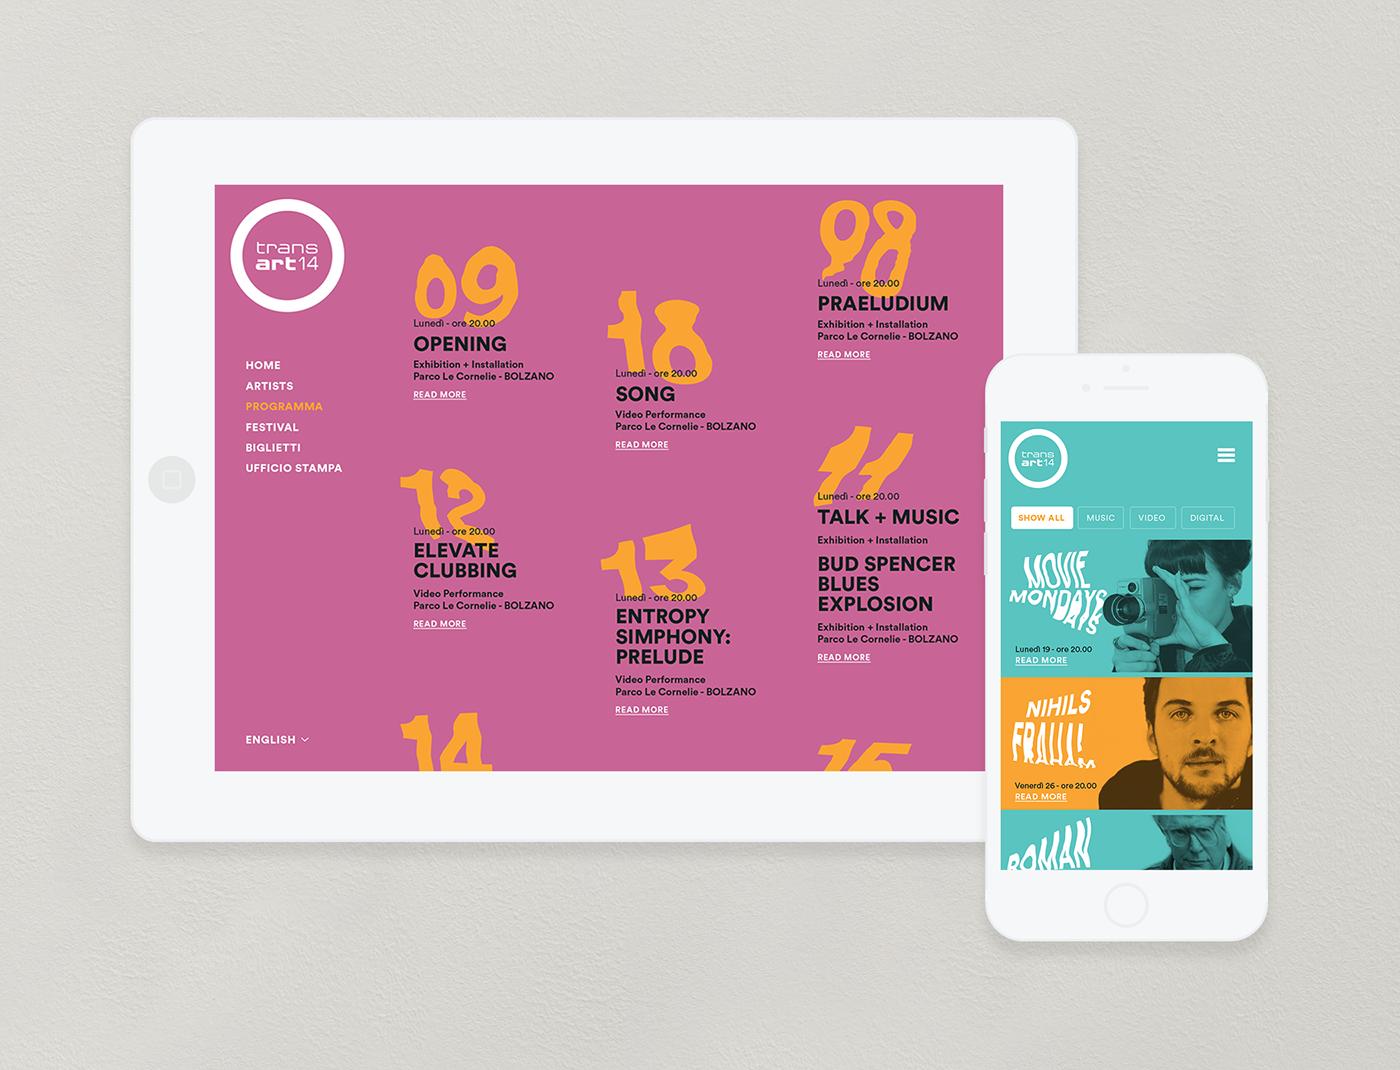 distortion festival iphone Webdesign Program poster art visual identity type palette